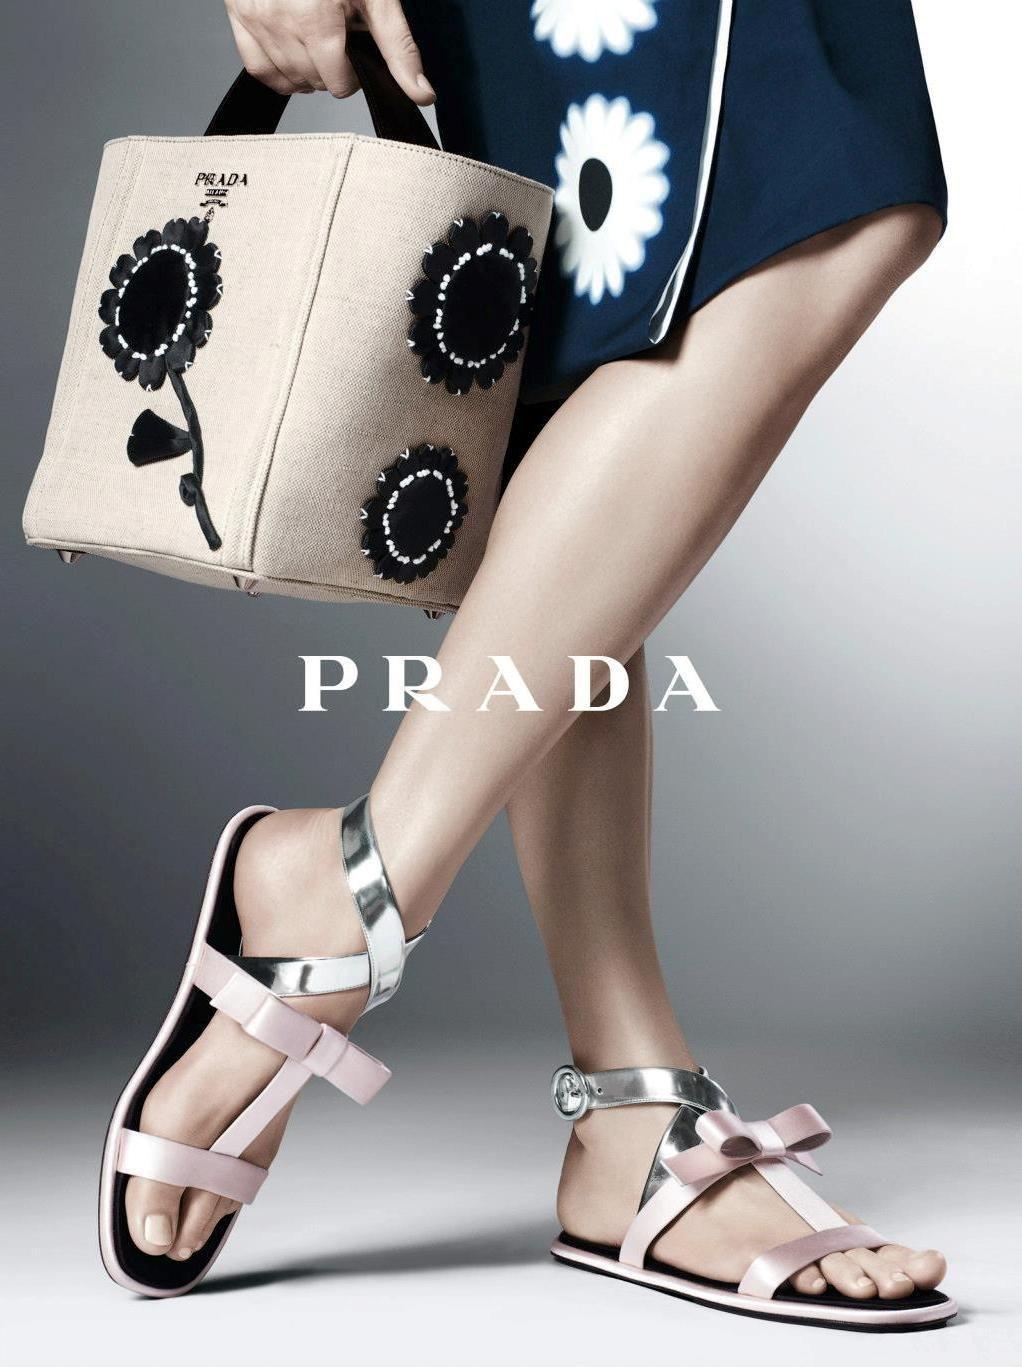 prada shoes used in she was pretty drama you